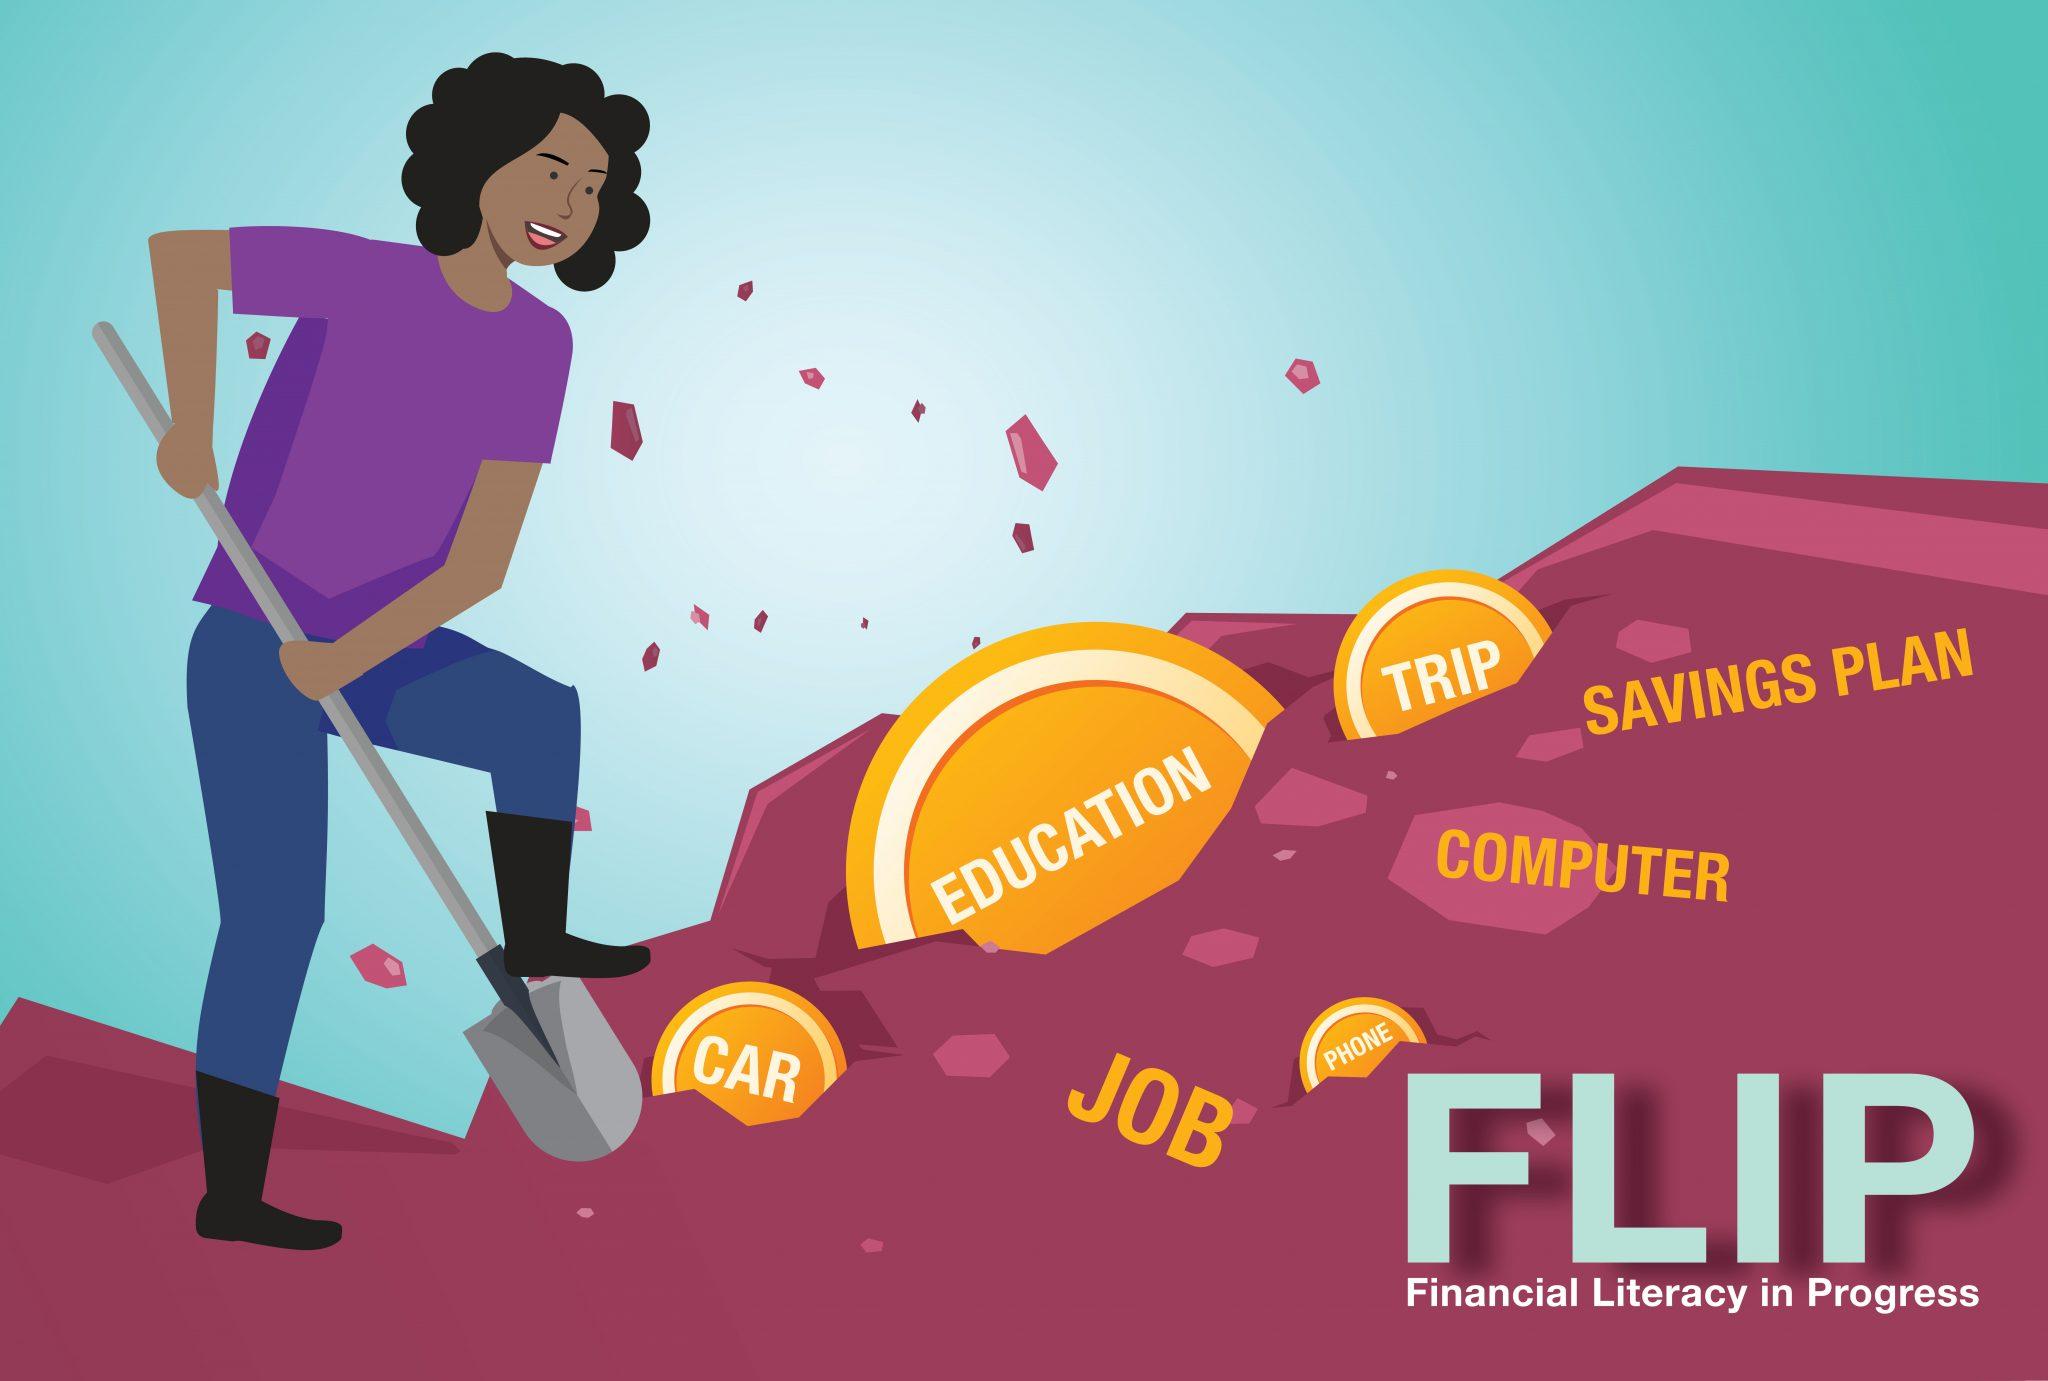 Illustration of a young woman digging for gold goals: education, phone, car, job, savings plan, computer, trip